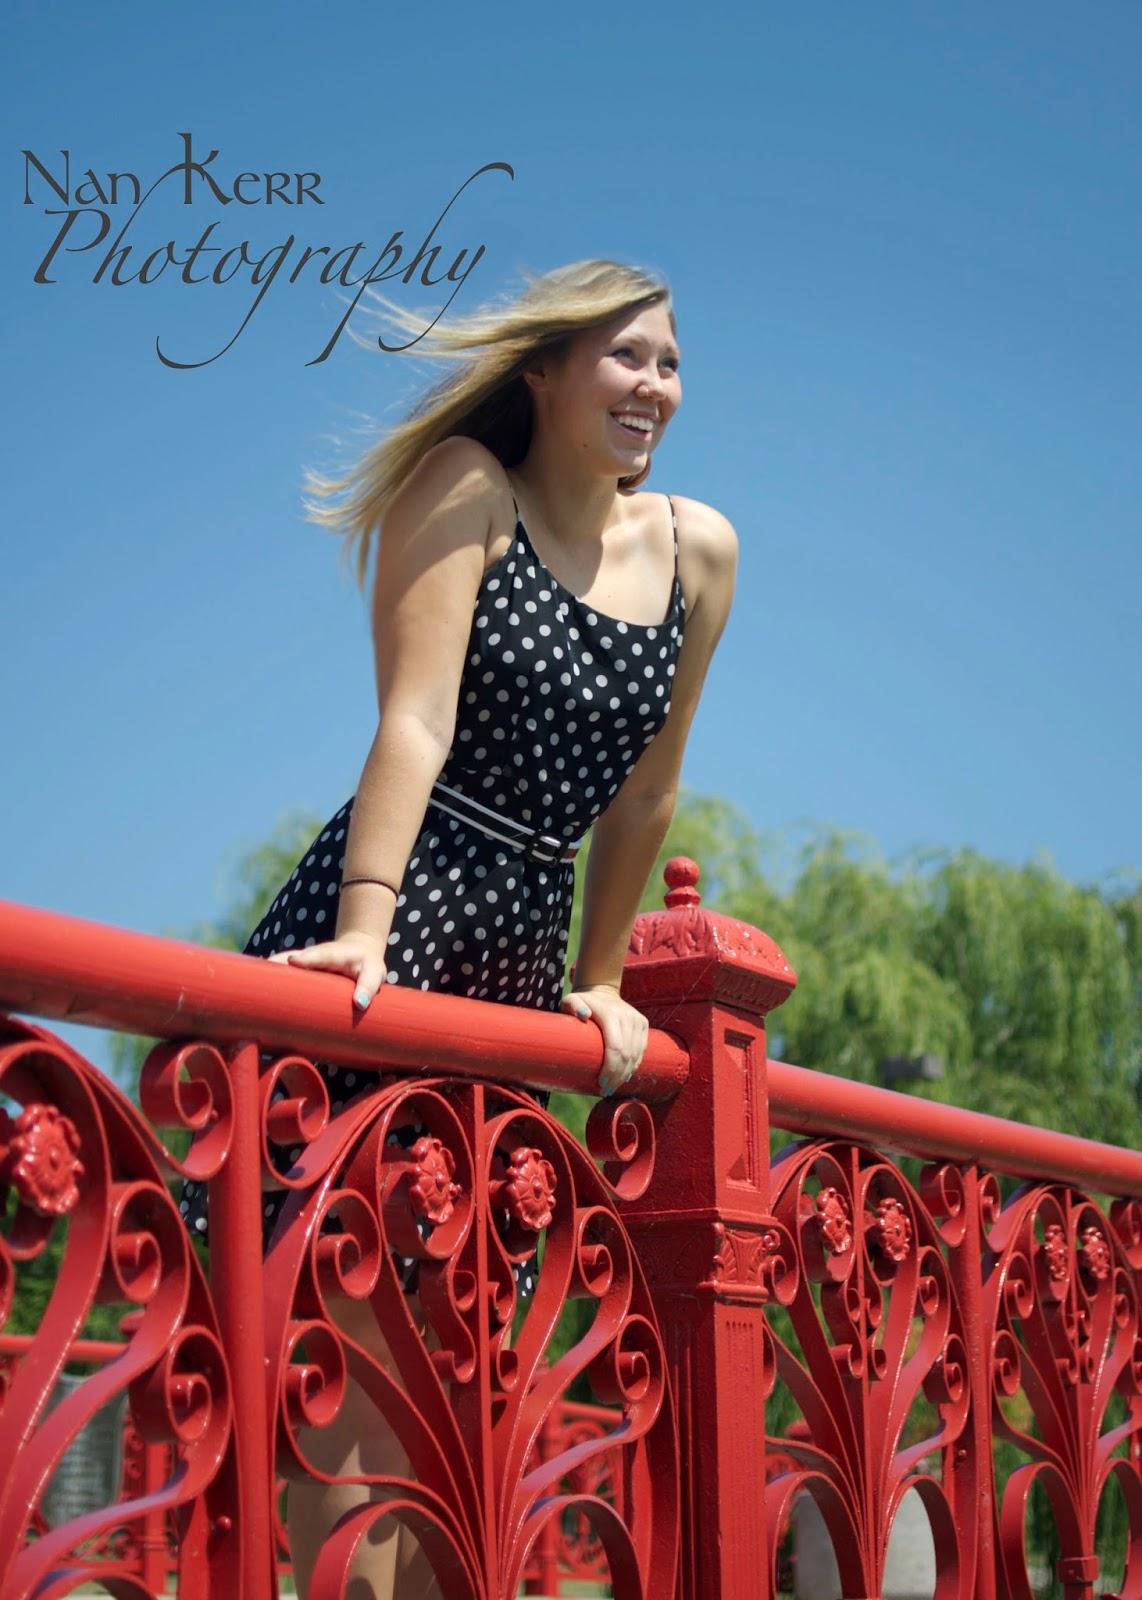 nan kerr photography sophie senior pictures